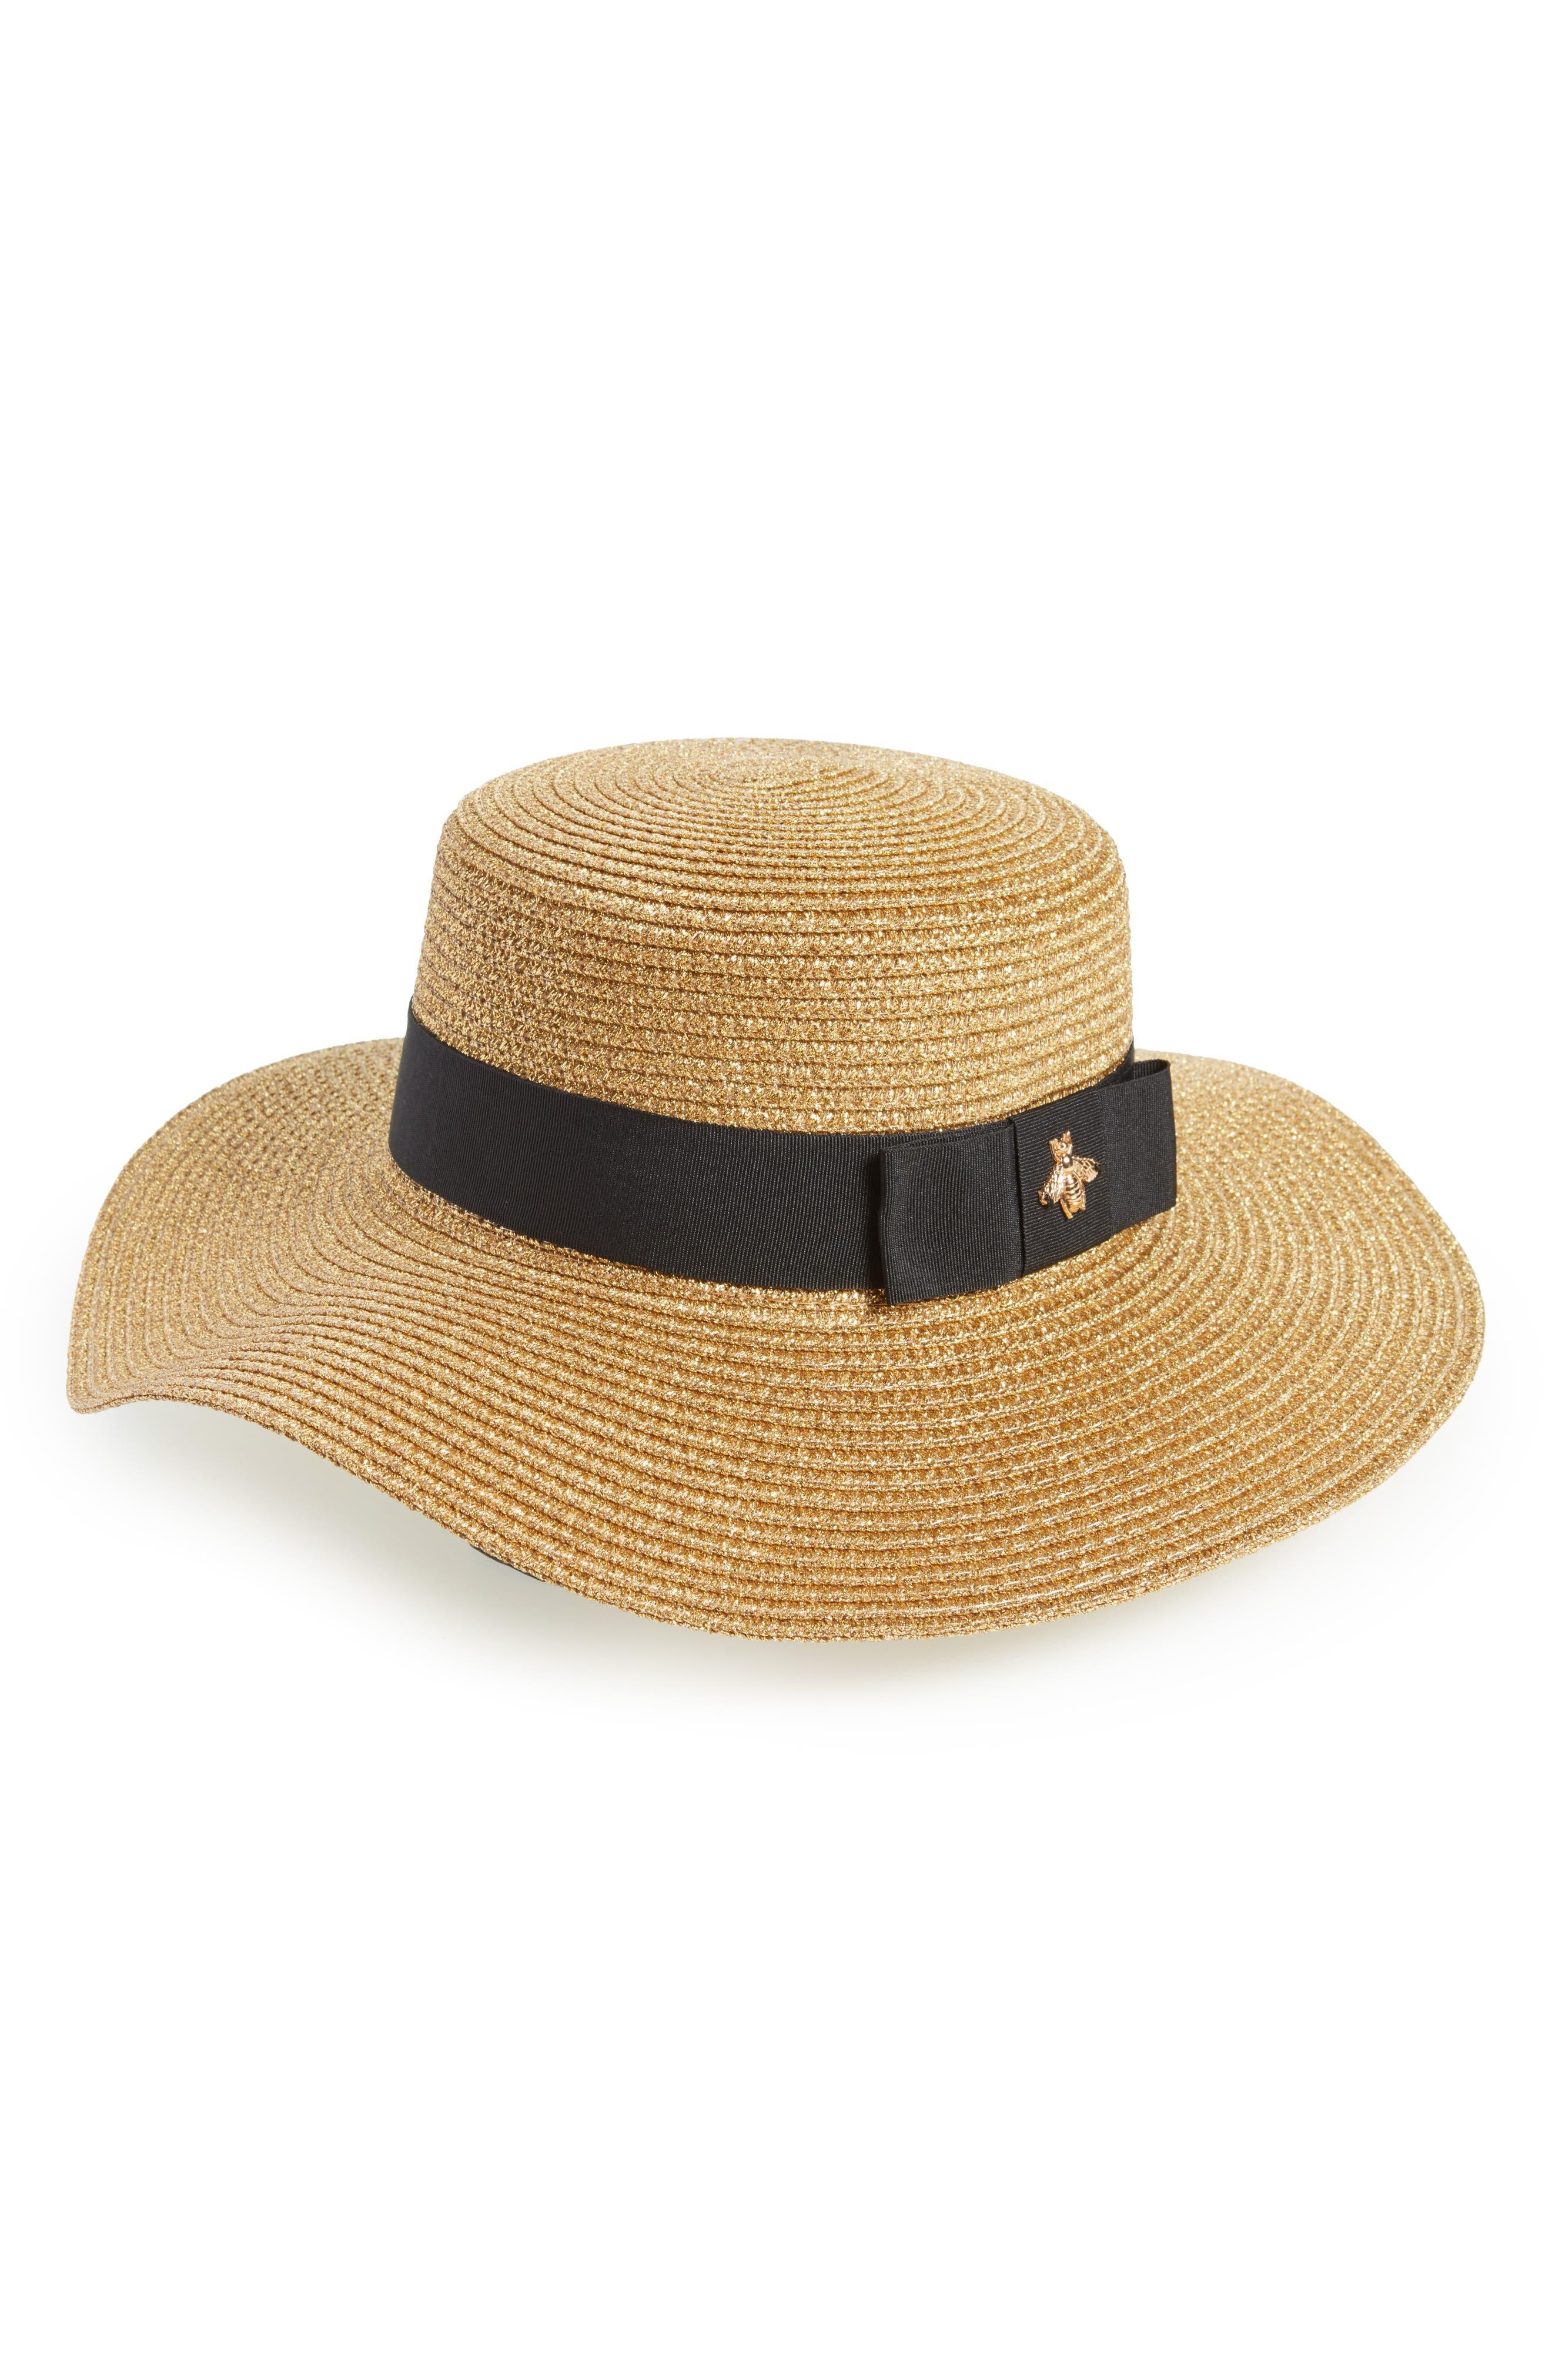 Glitter Bee Boater Hat,                         Main,                         color, Natural/ Black